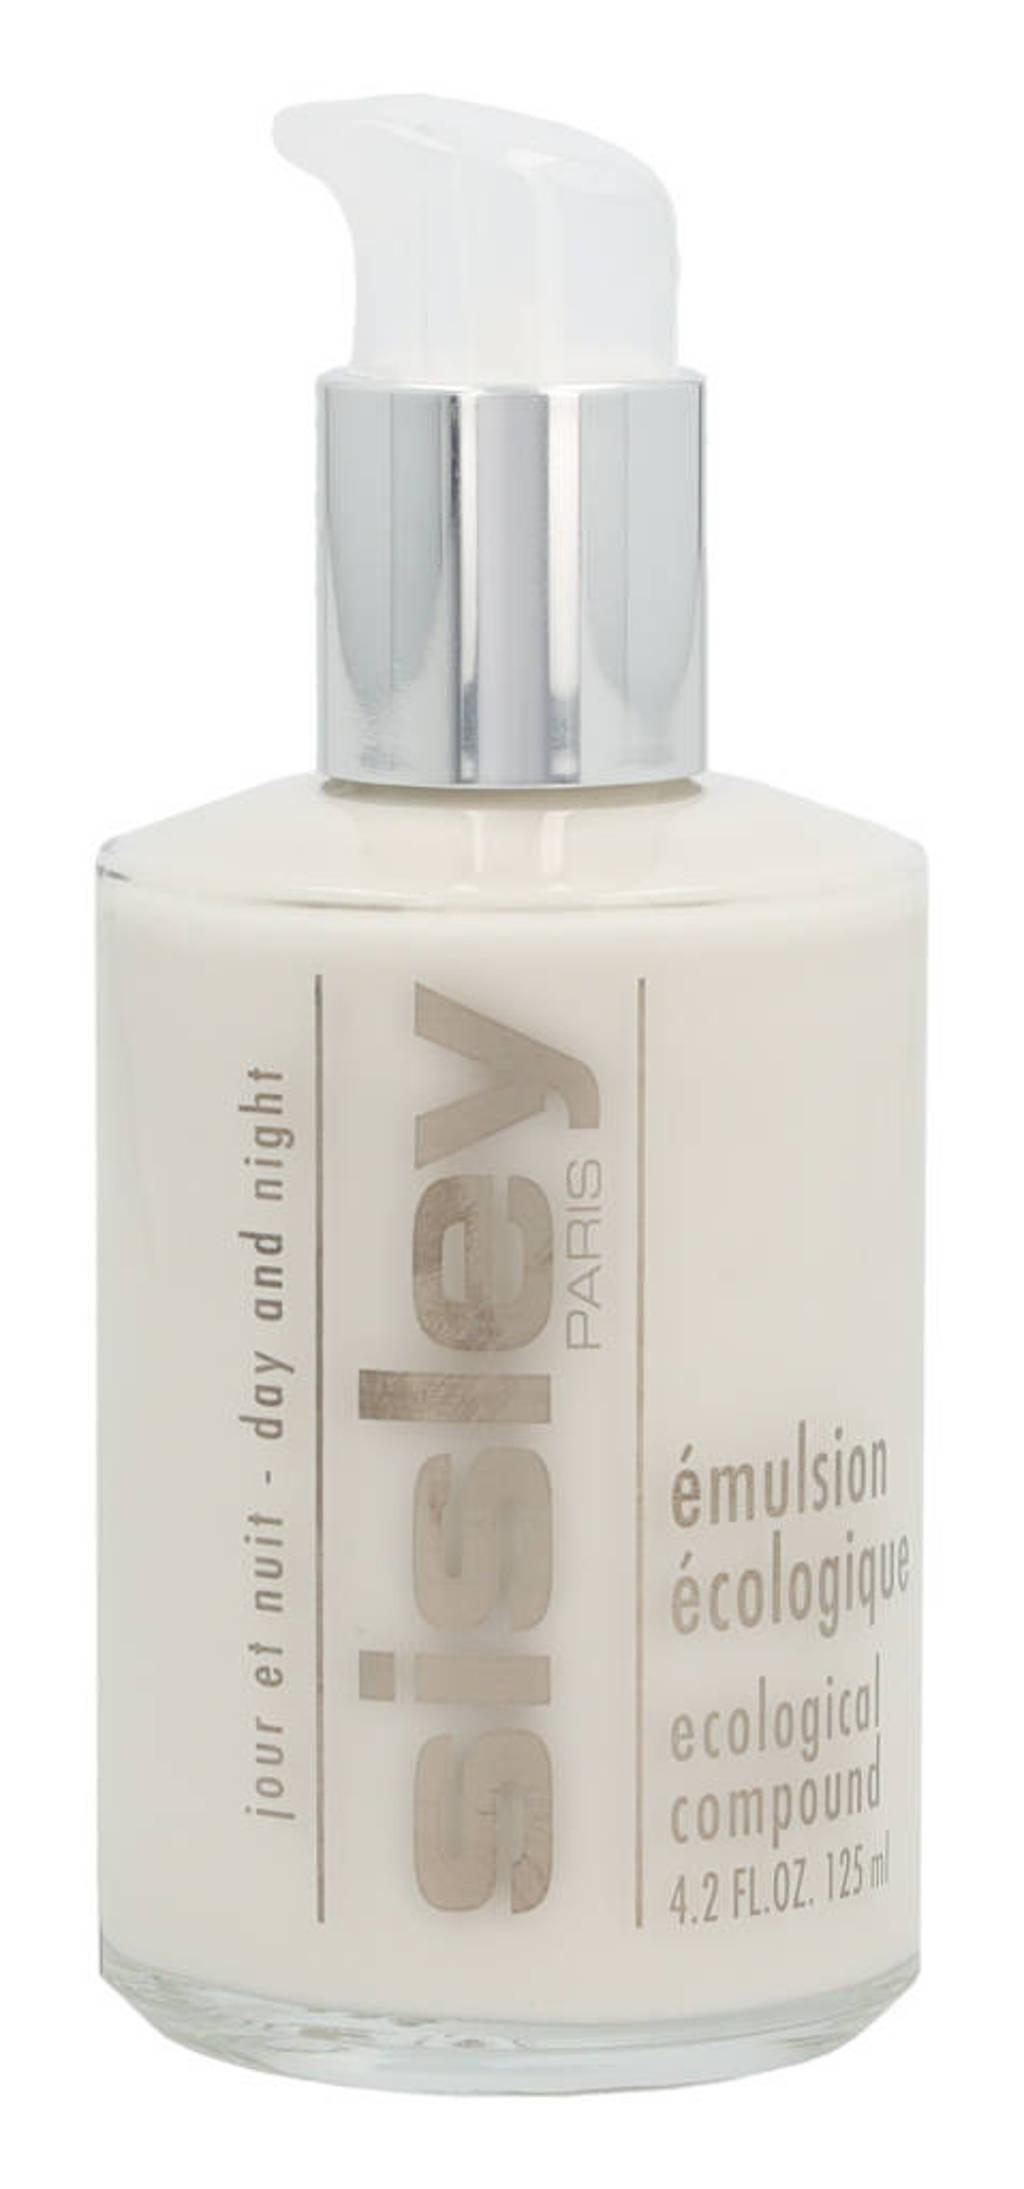 Sisley Day & Night Ecological Compound gezichtscrème - 60 ml